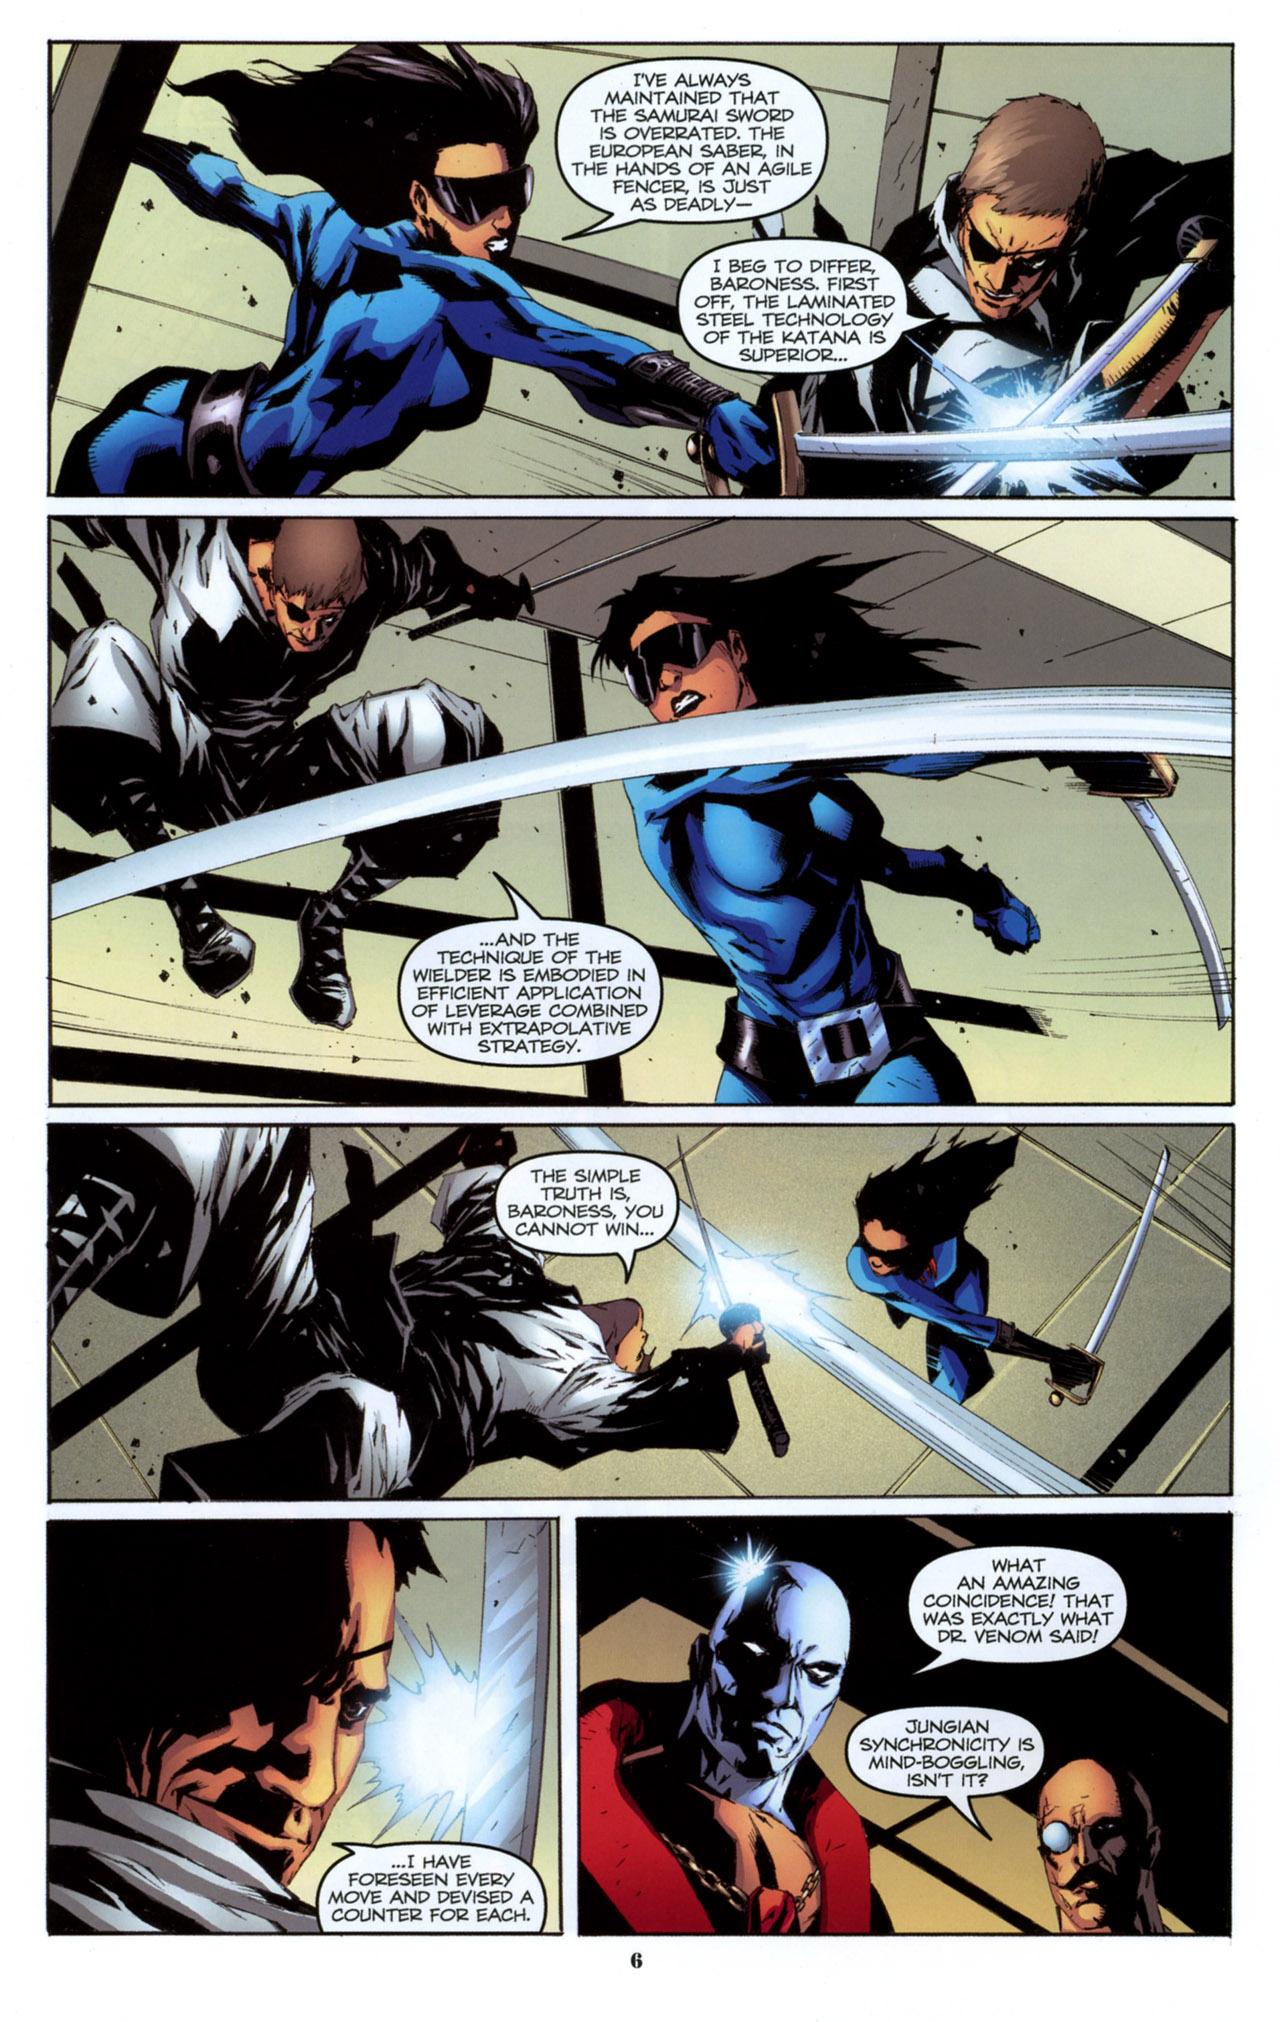 G.I. Joe: A Real American Hero 157 Page 7